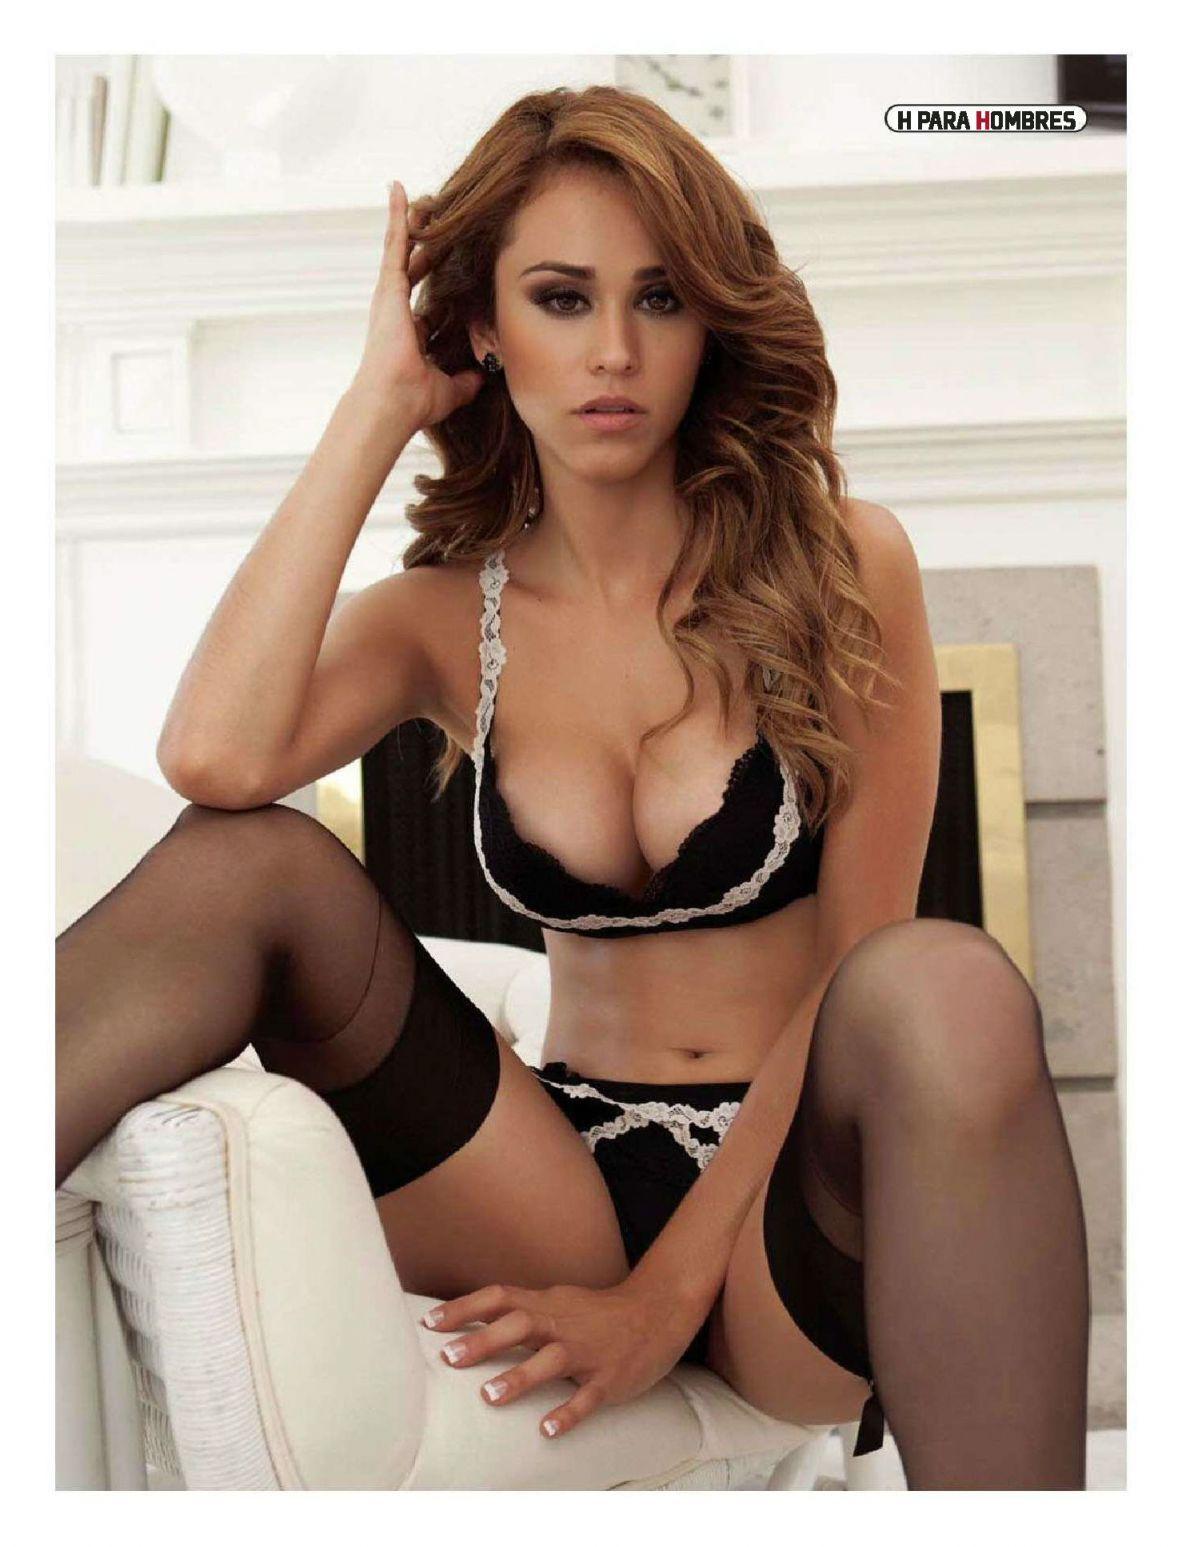 Revista de modelo desnuda photo 988